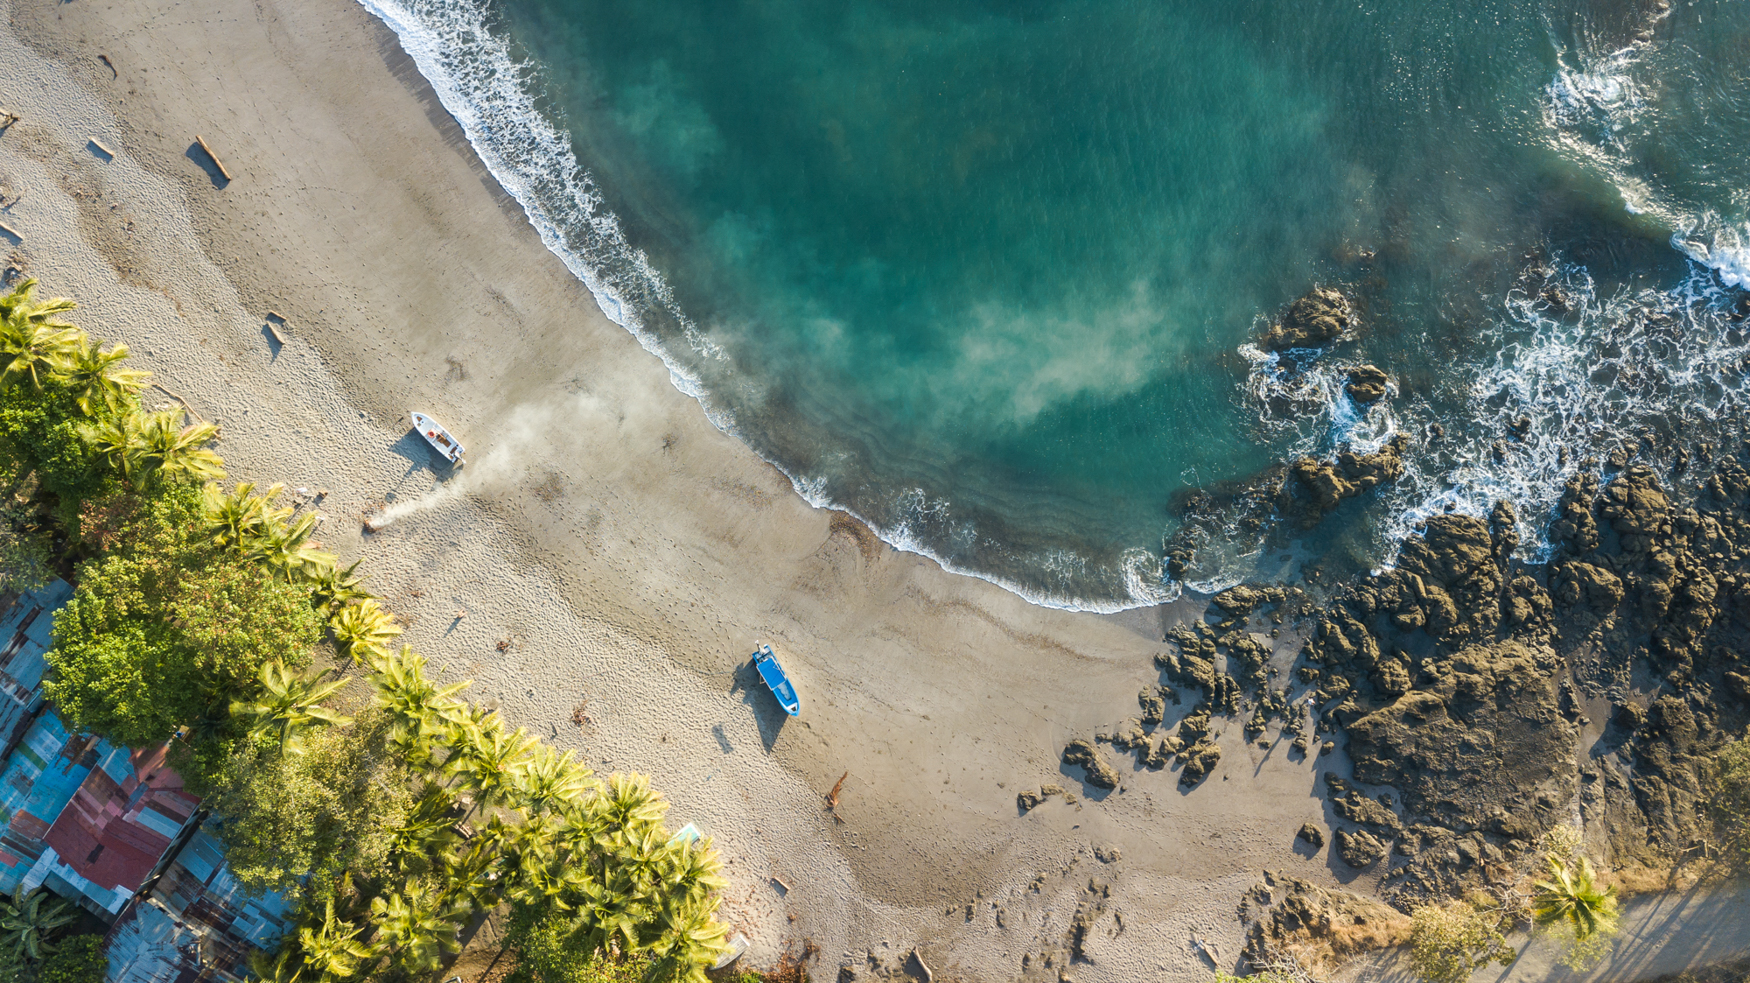 Yoga-Retreat-Drone-Photography-Costa-Rica-3.jpg